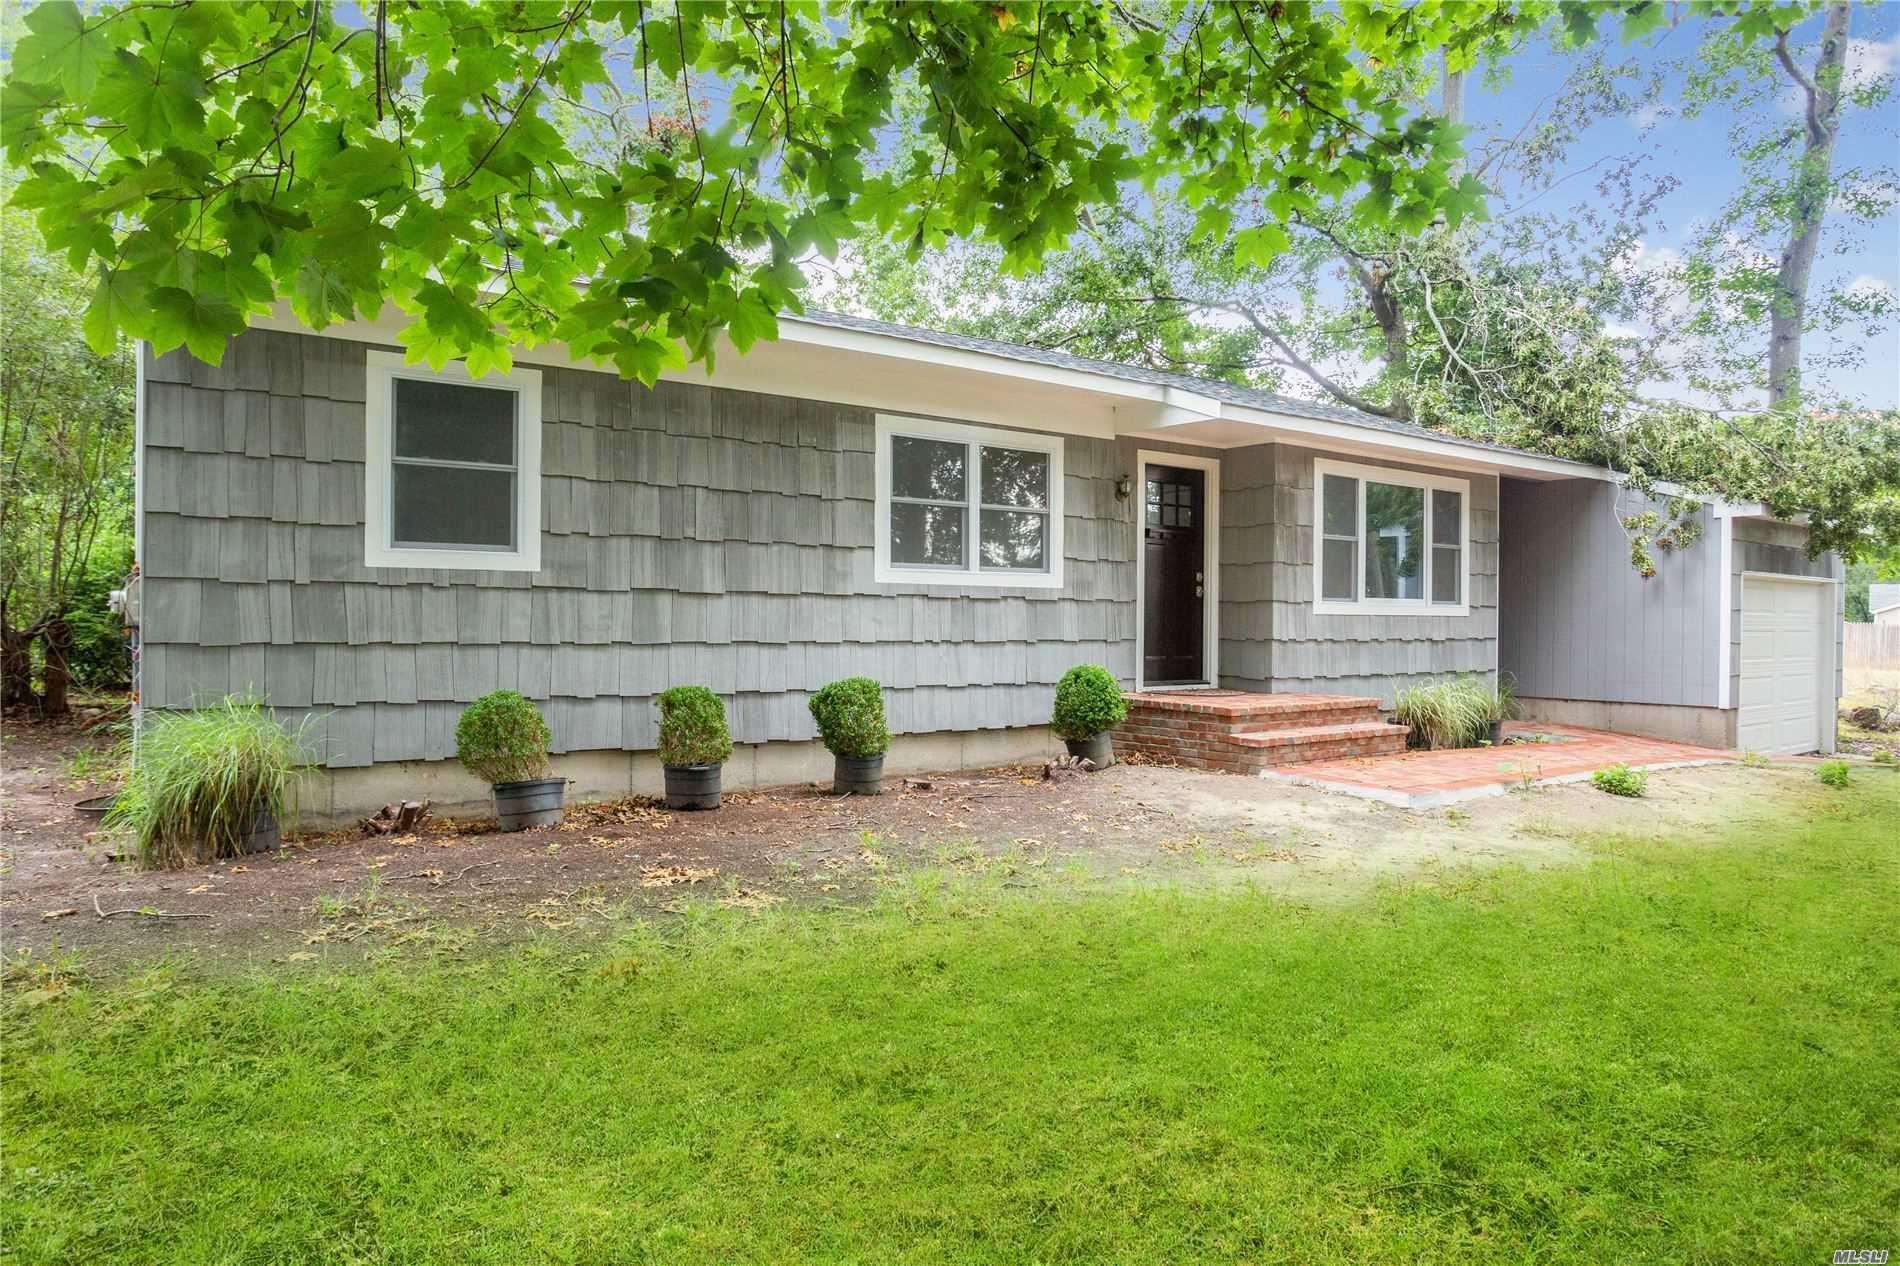 64 Primrose Path, Manorville, NY 11949 - MLS#: 3244541